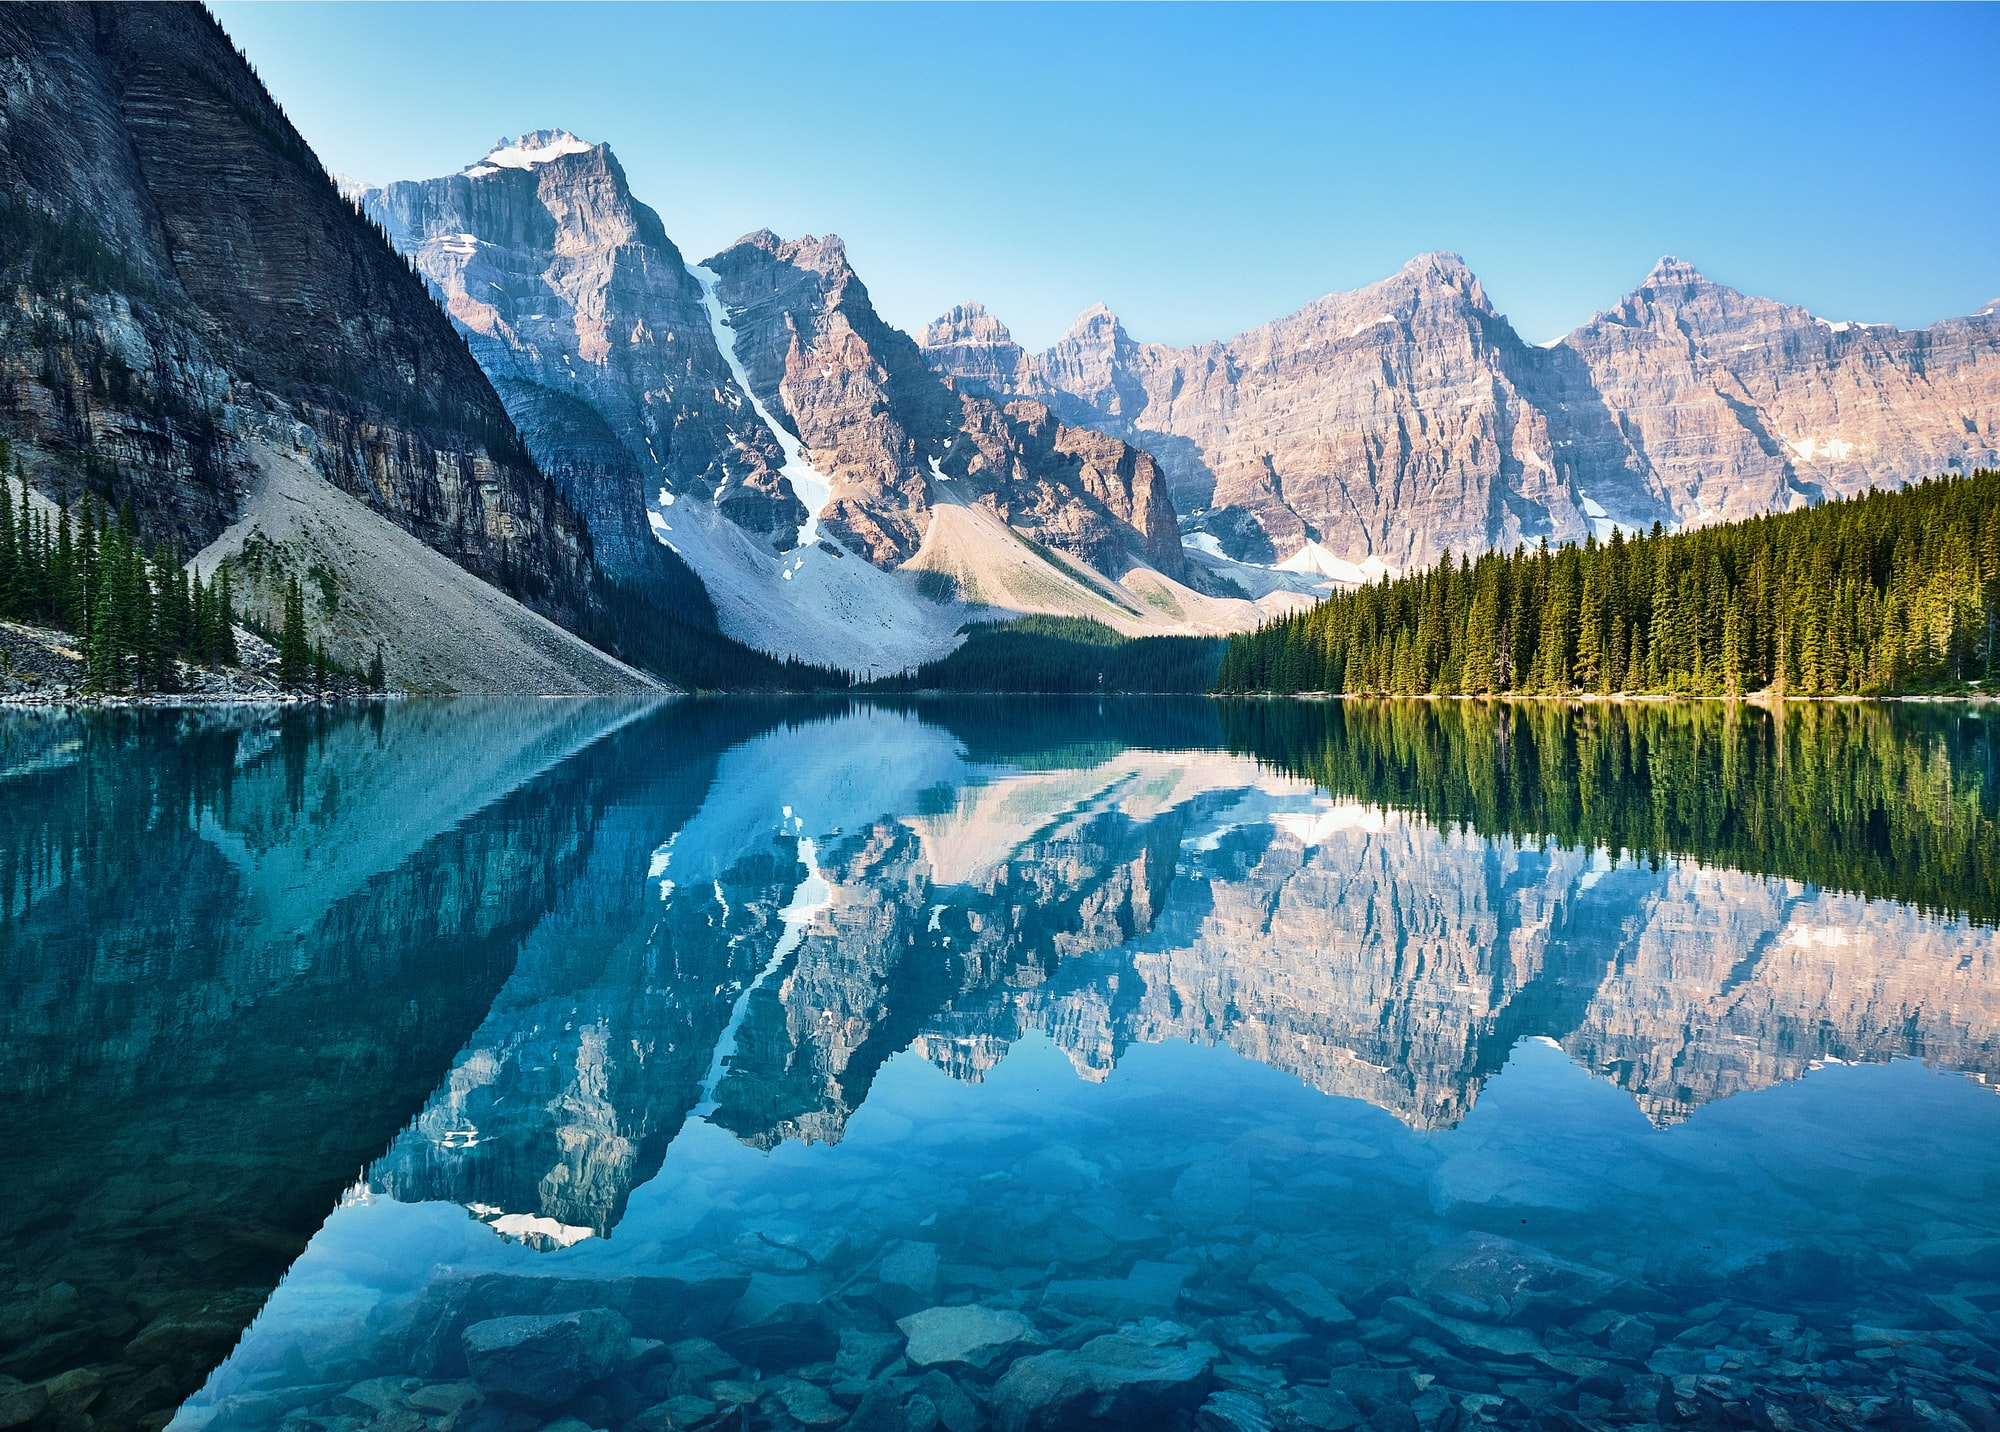 Explore Banff National Park in Alberta, Canada